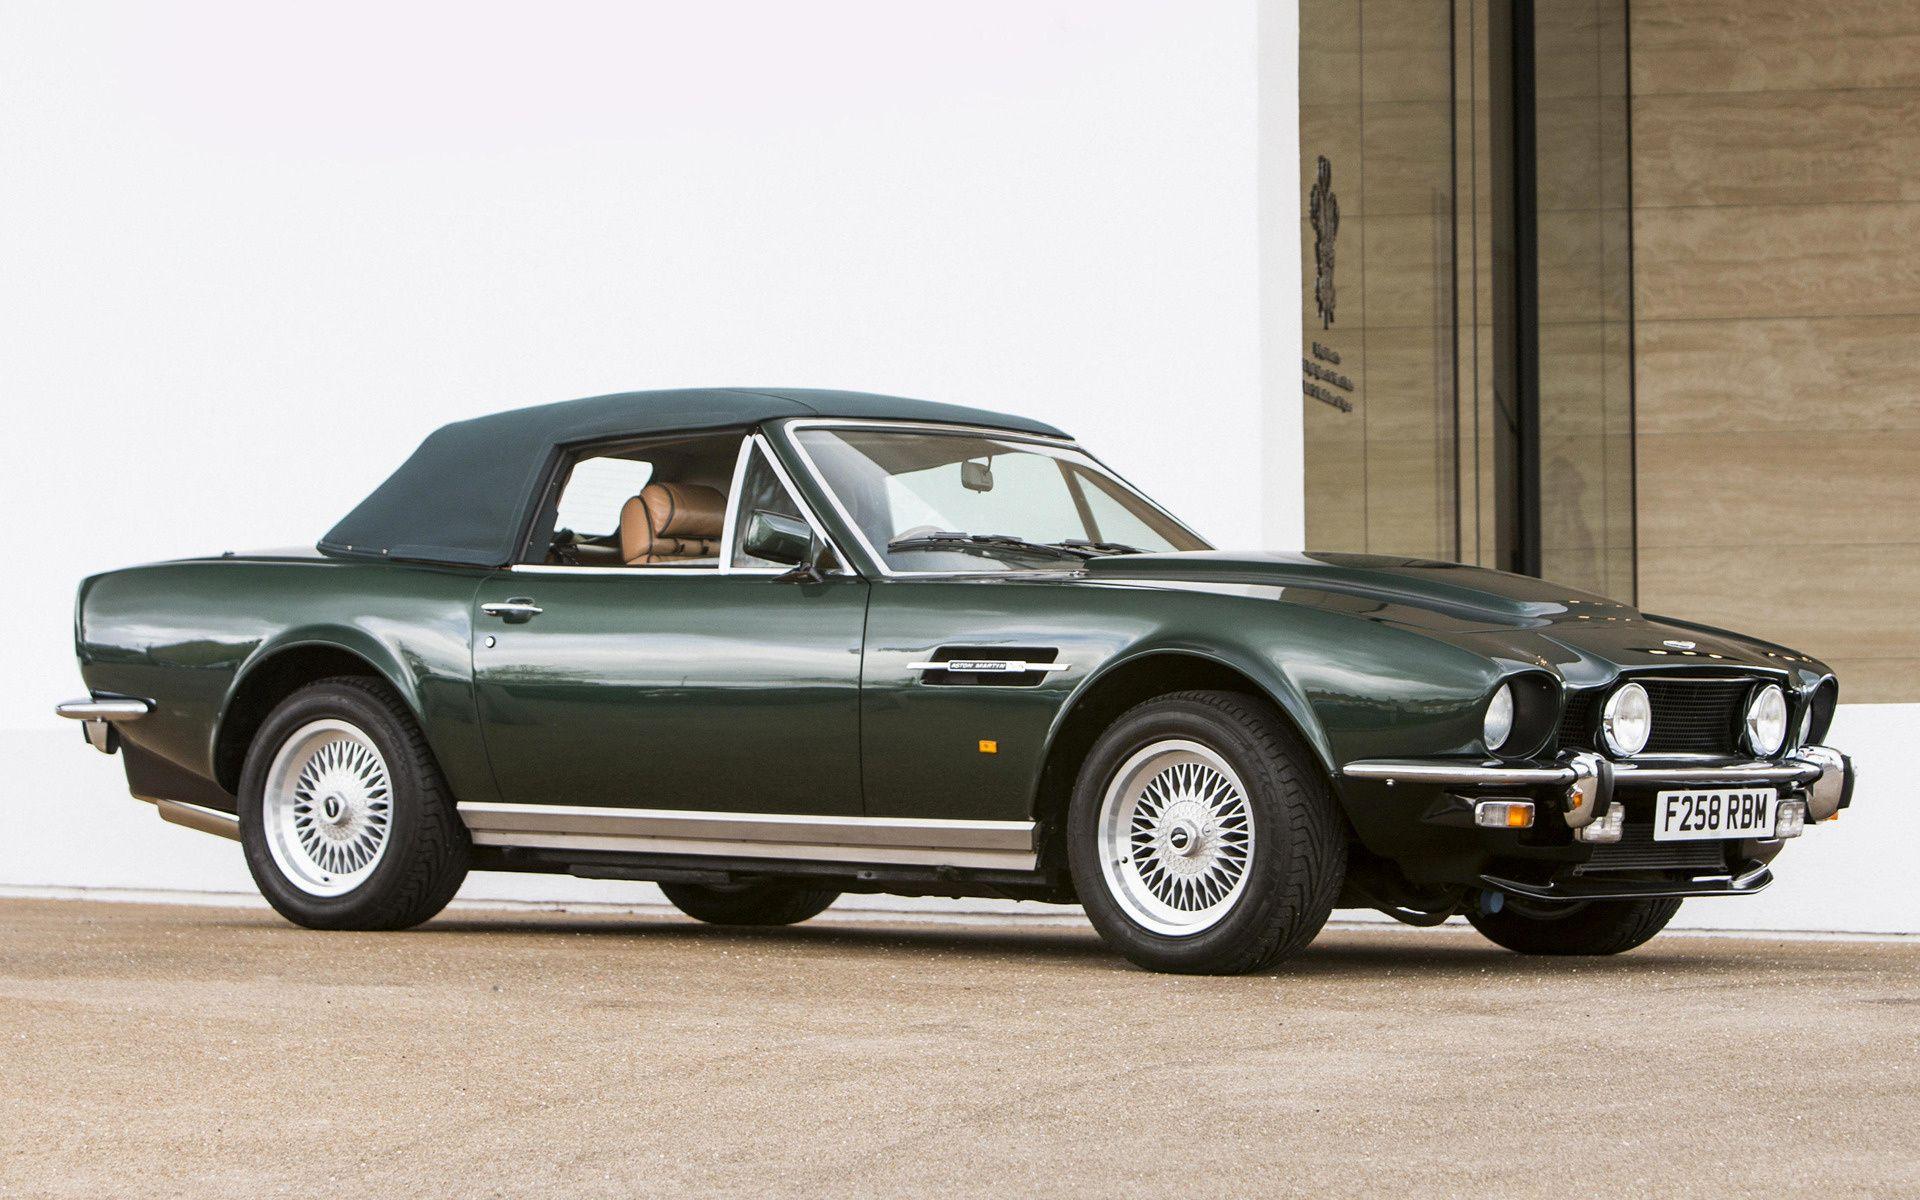 1989 Aston Martin V8 Vantage Volante Prince Of Wales Traumauto Autos Petrol